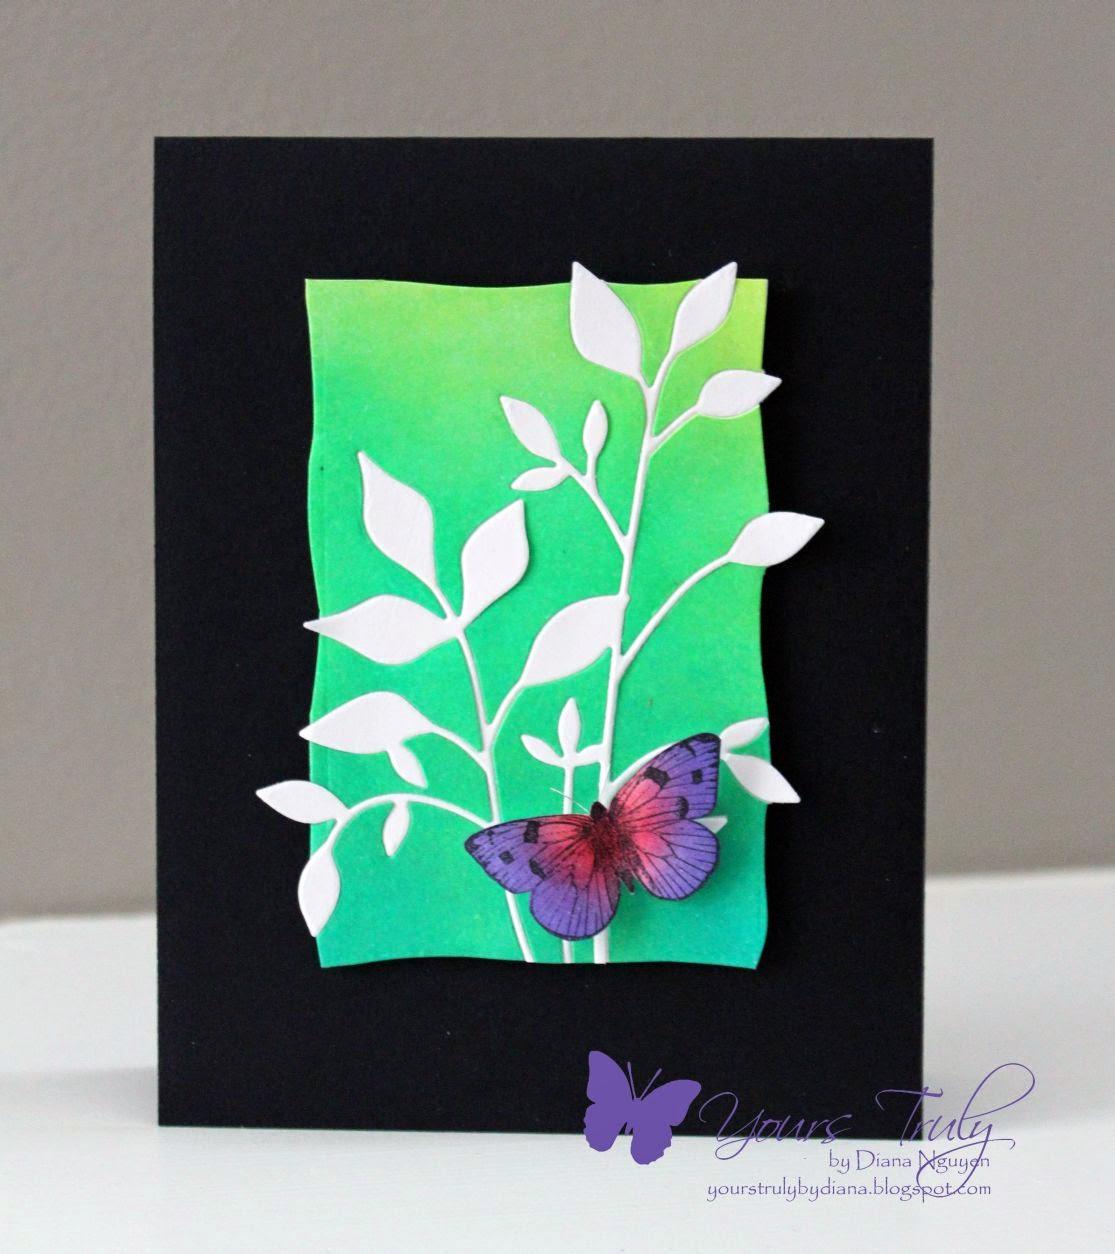 Diana Nguyen, Memory Box Fresh Foliage, Hero Arts, Ombre